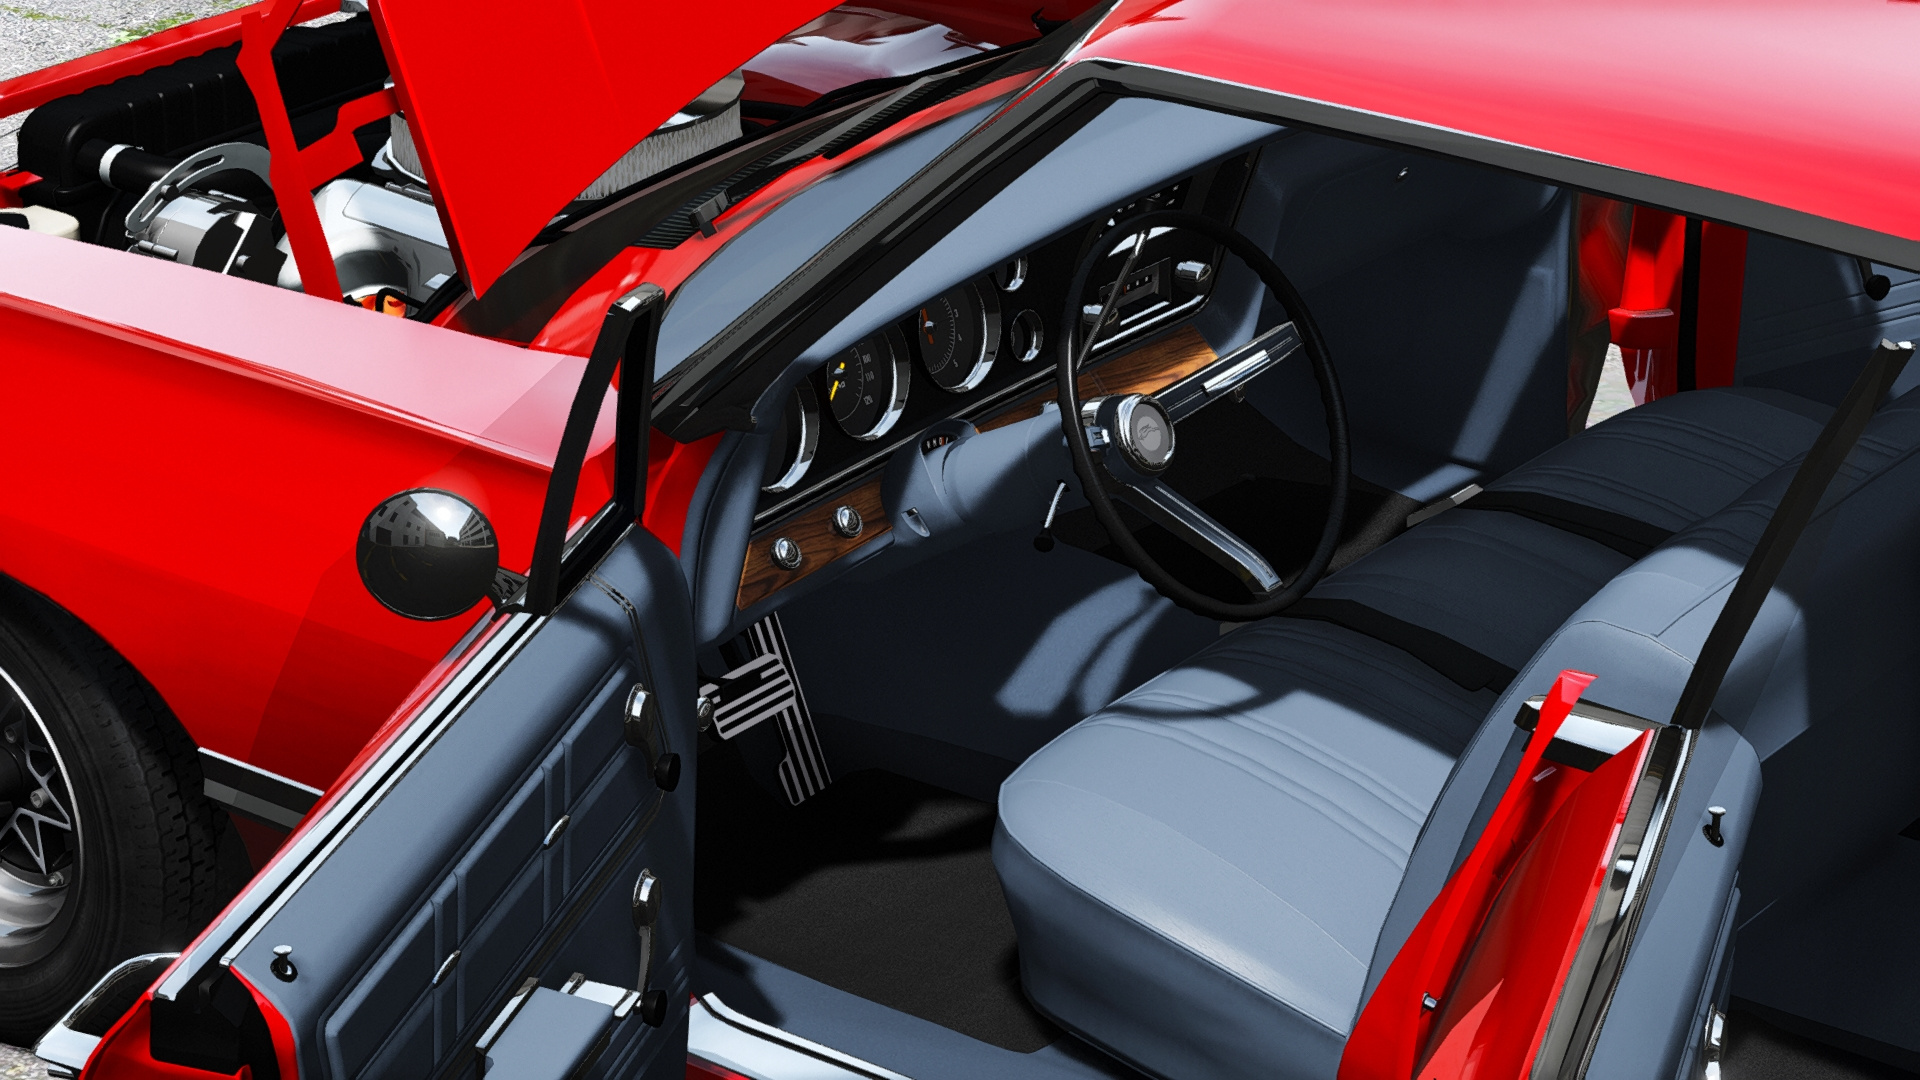 1967 Chevrolet Impala Sport Sedan 396 Turbo Jet [Add on] GTA5 Mods